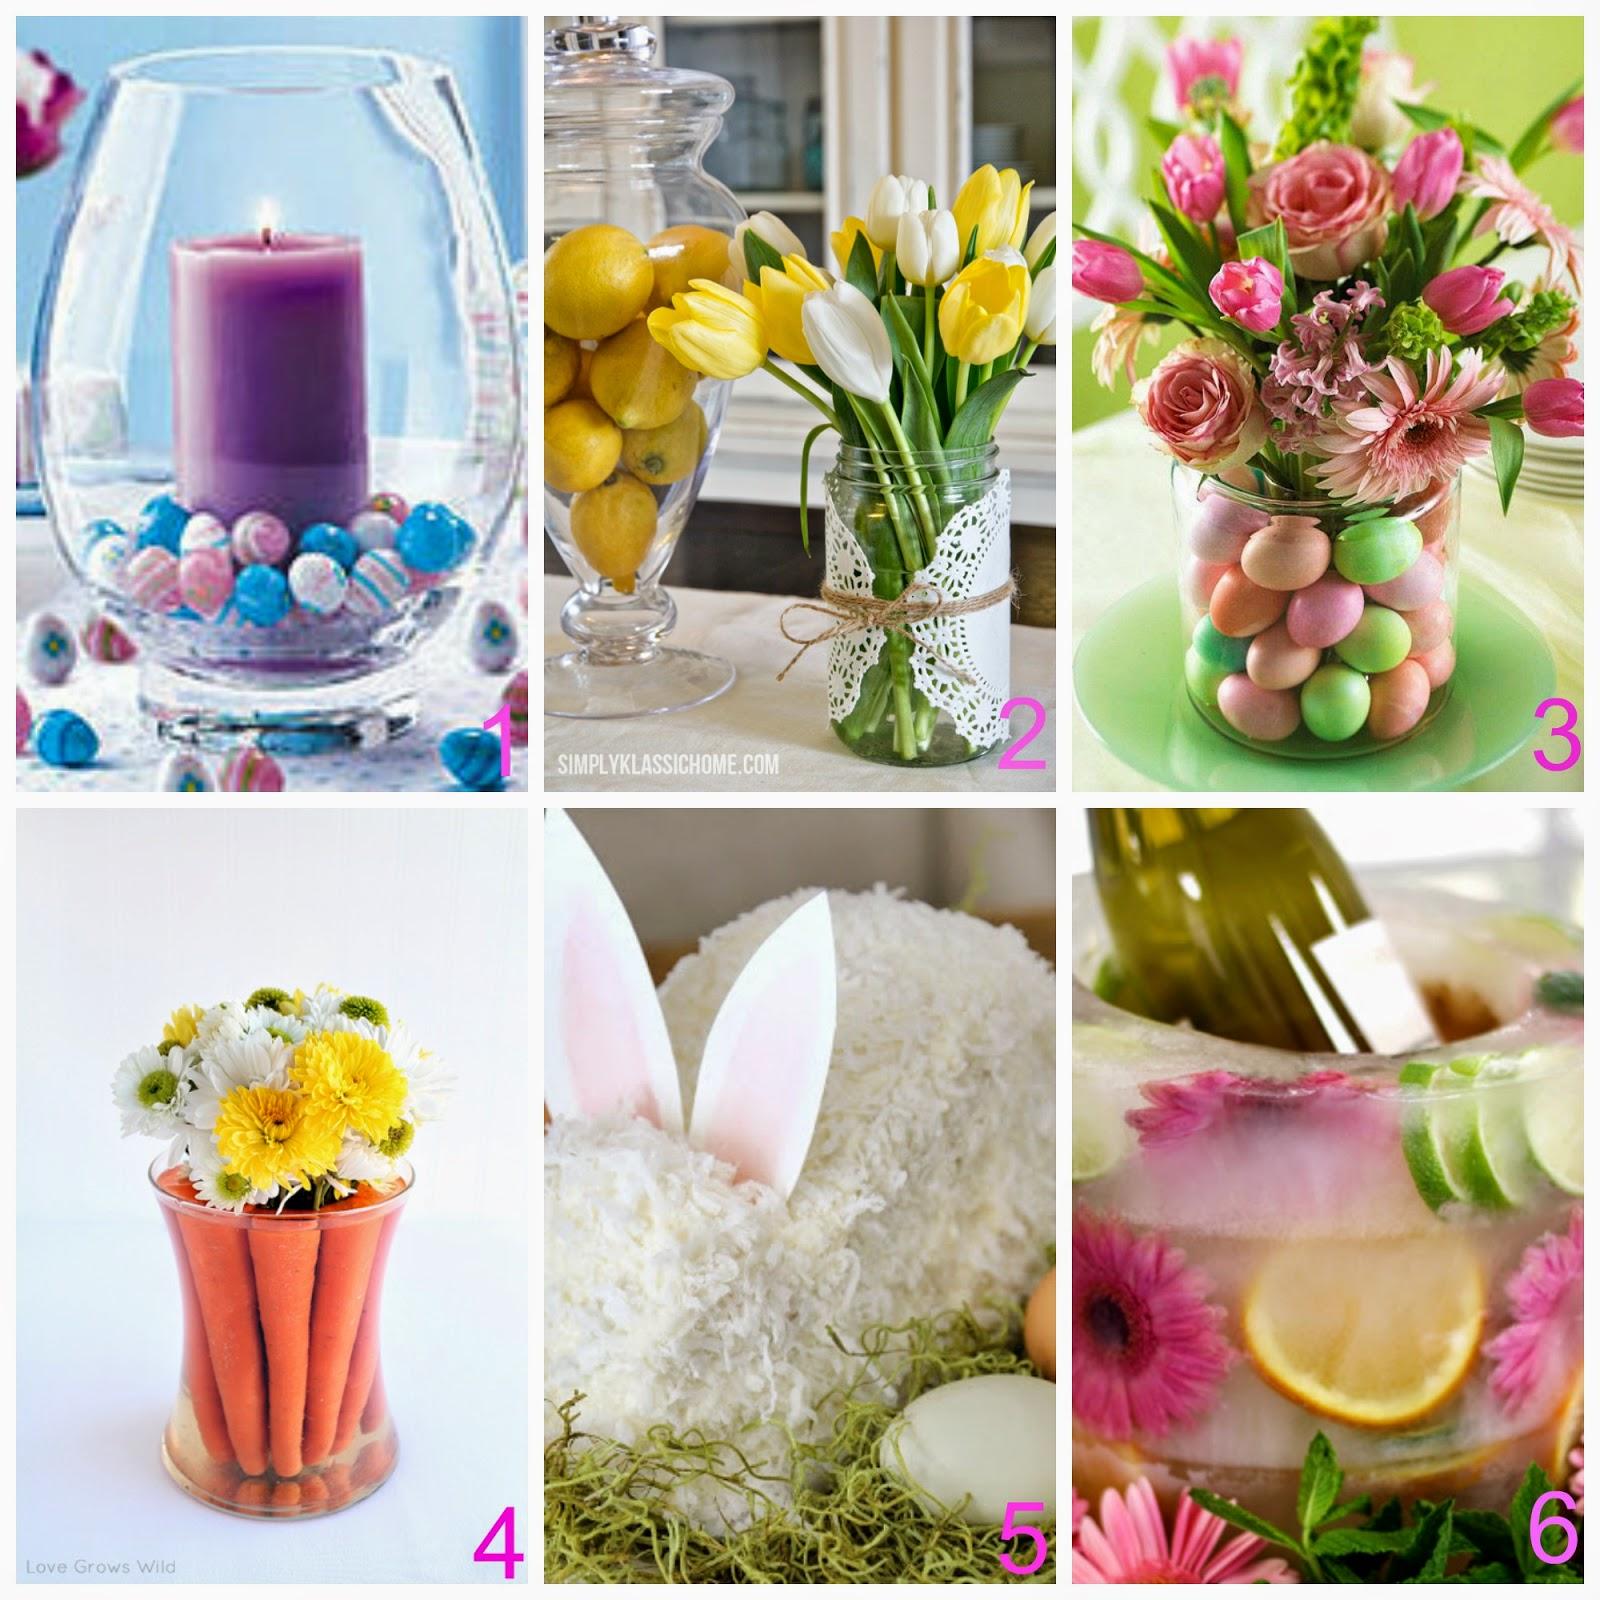 Top Centrotavola fai da te per Pasqua | donneinpink magazine GQ67